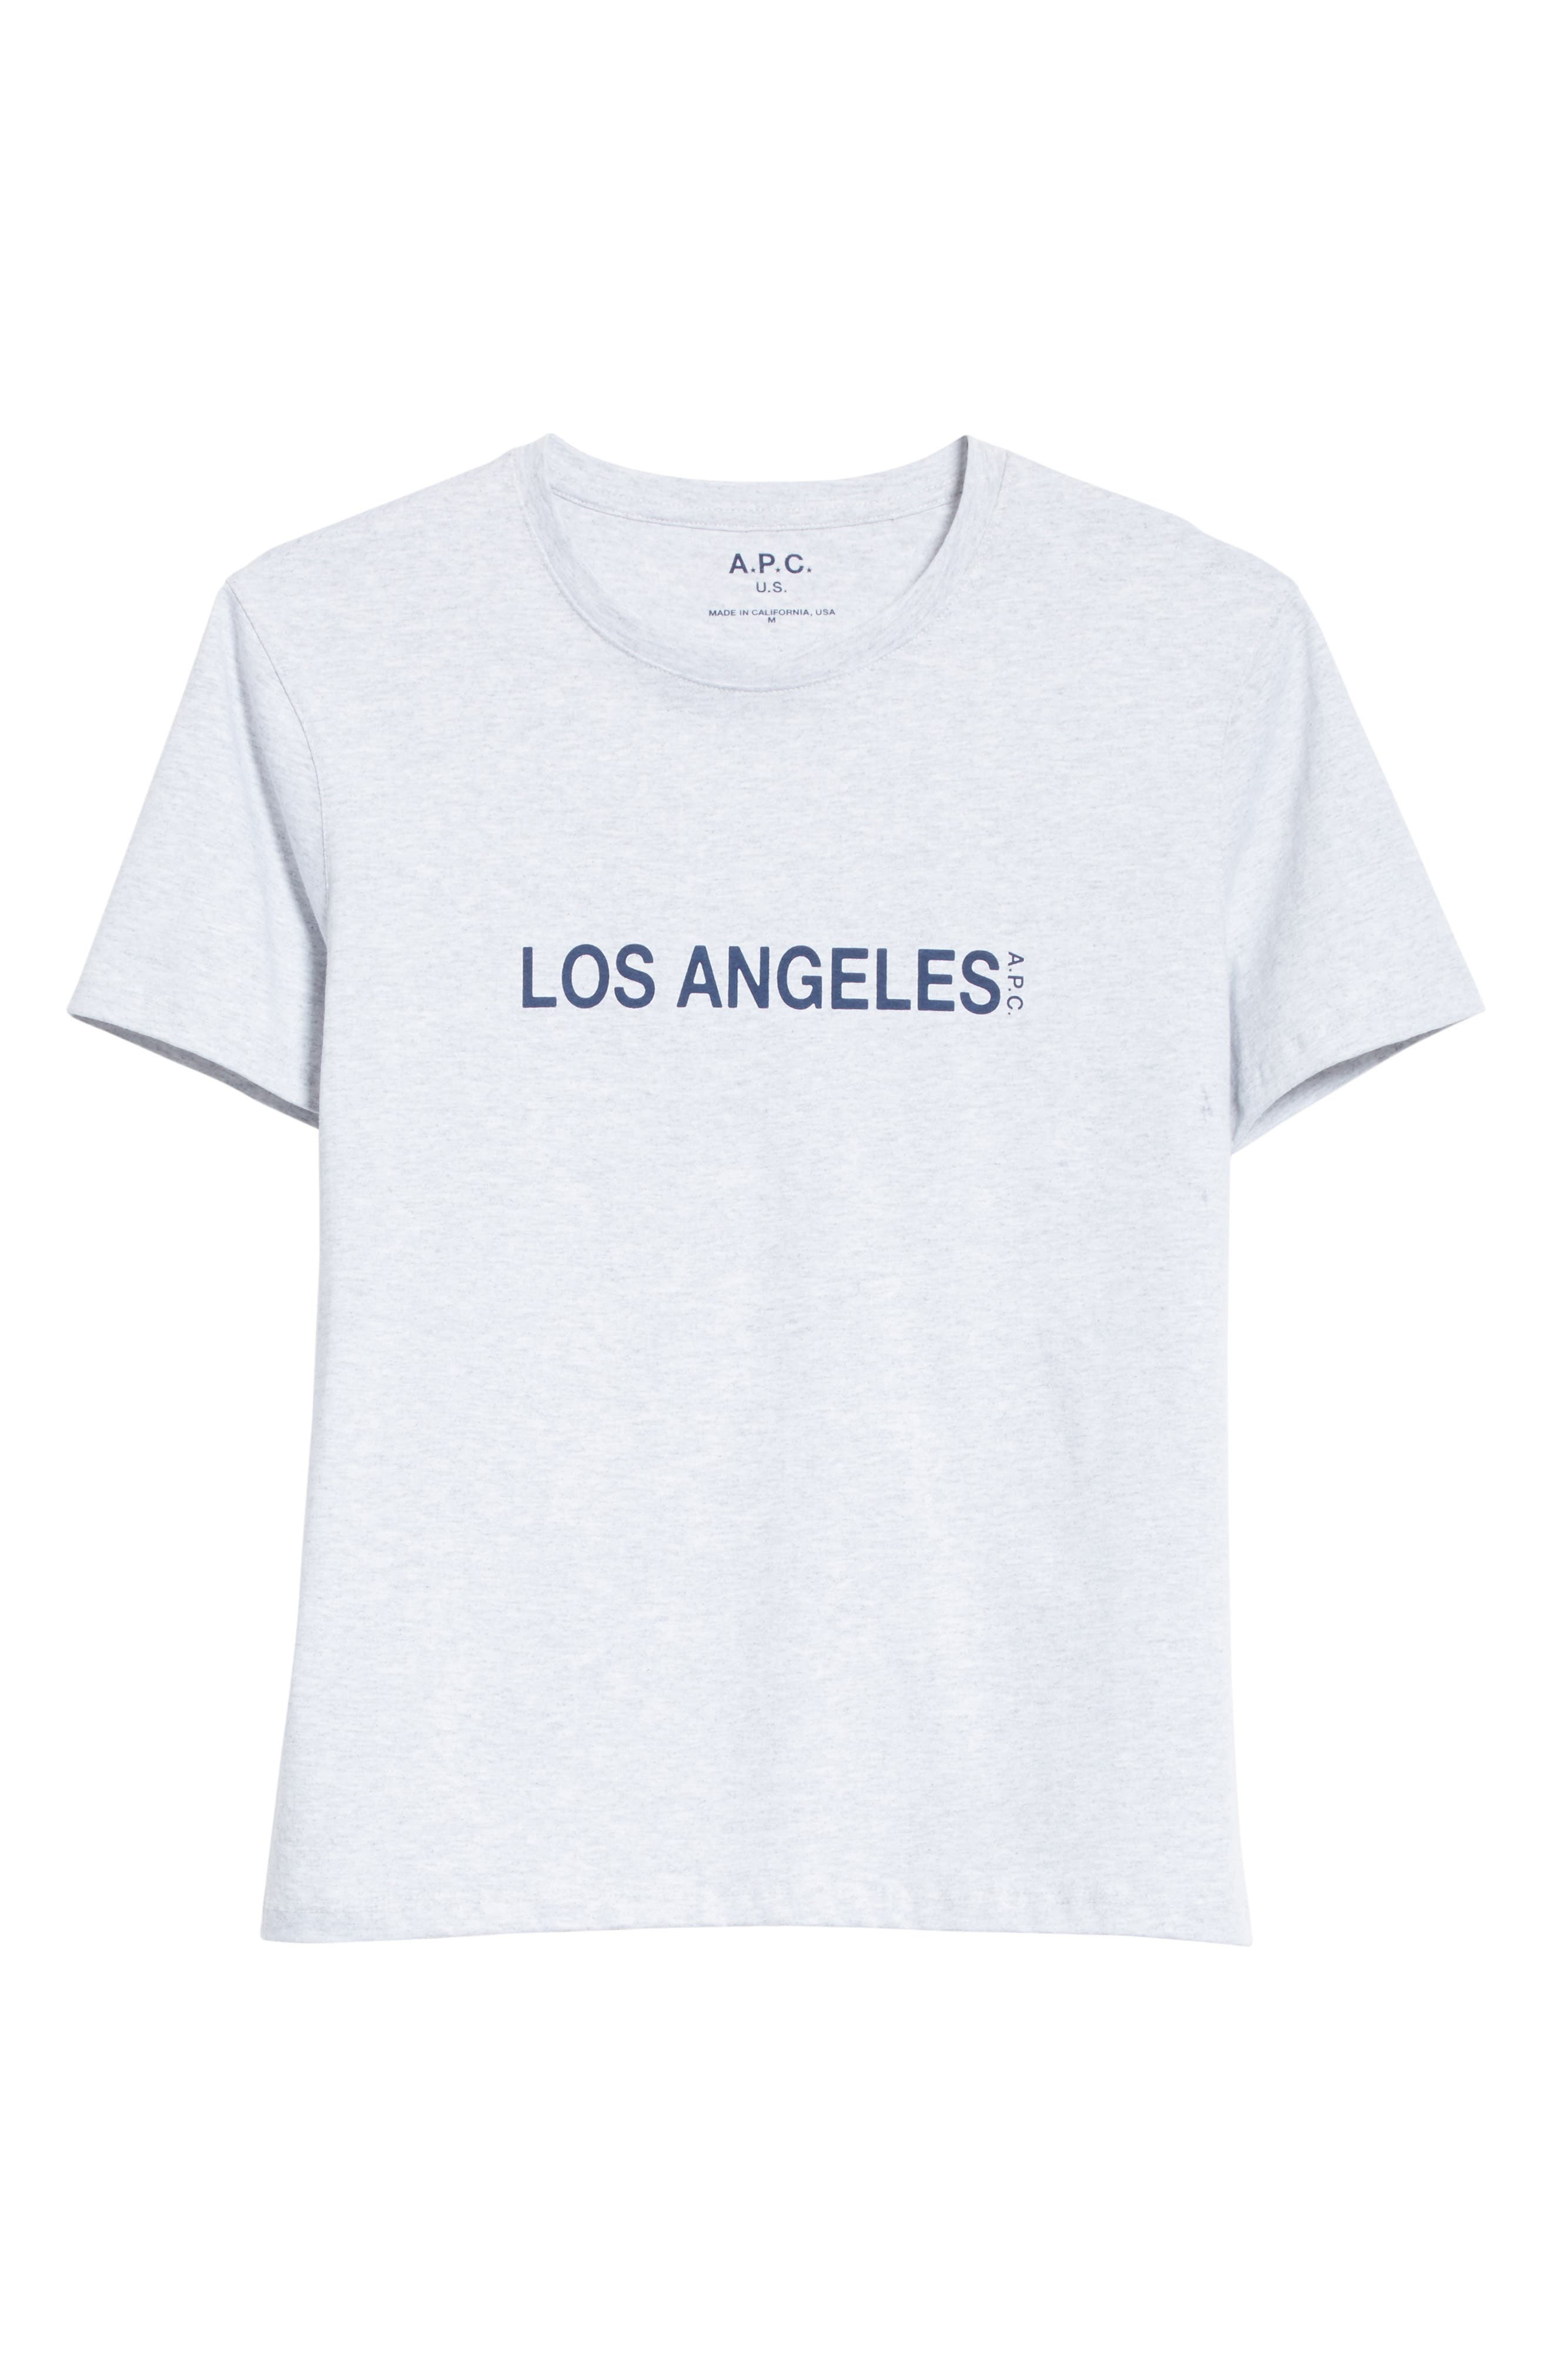 Los Angeles Graphic T-Shirt,                             Alternate thumbnail 6, color,                             063